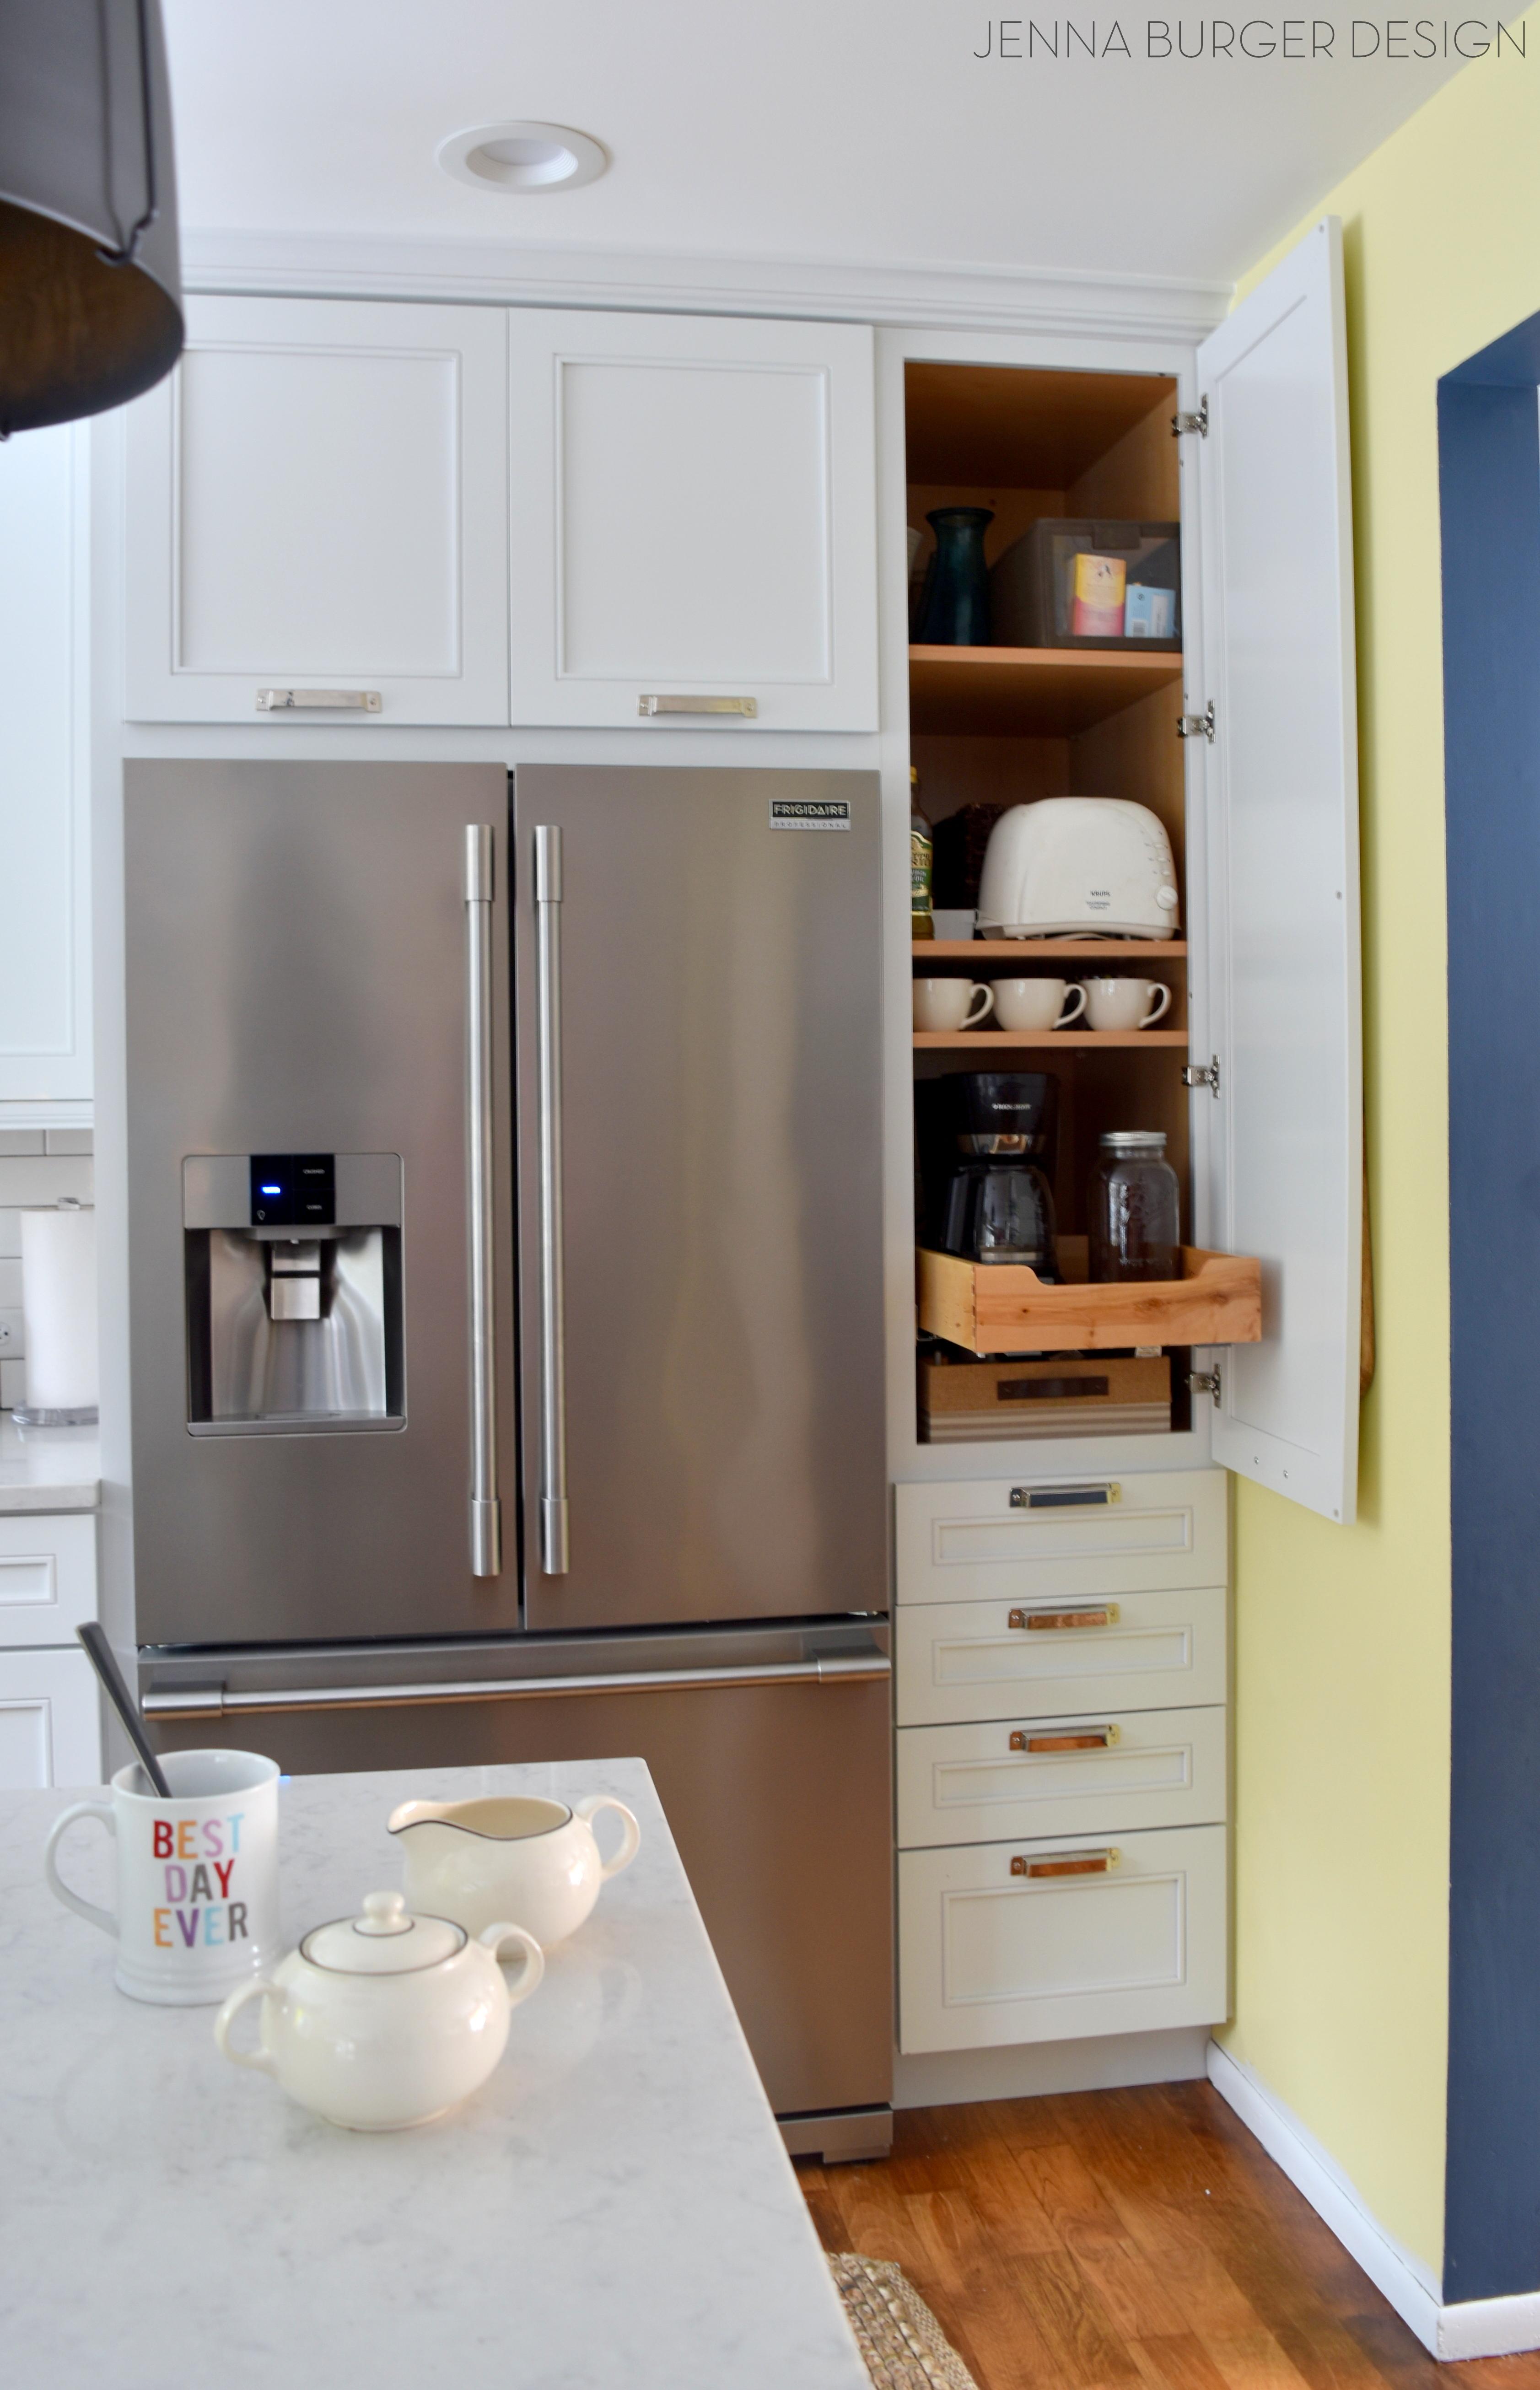 Diy Kitchen Cabinets Makeover Kitchen Renovation Reveal Resources Jenna Burger